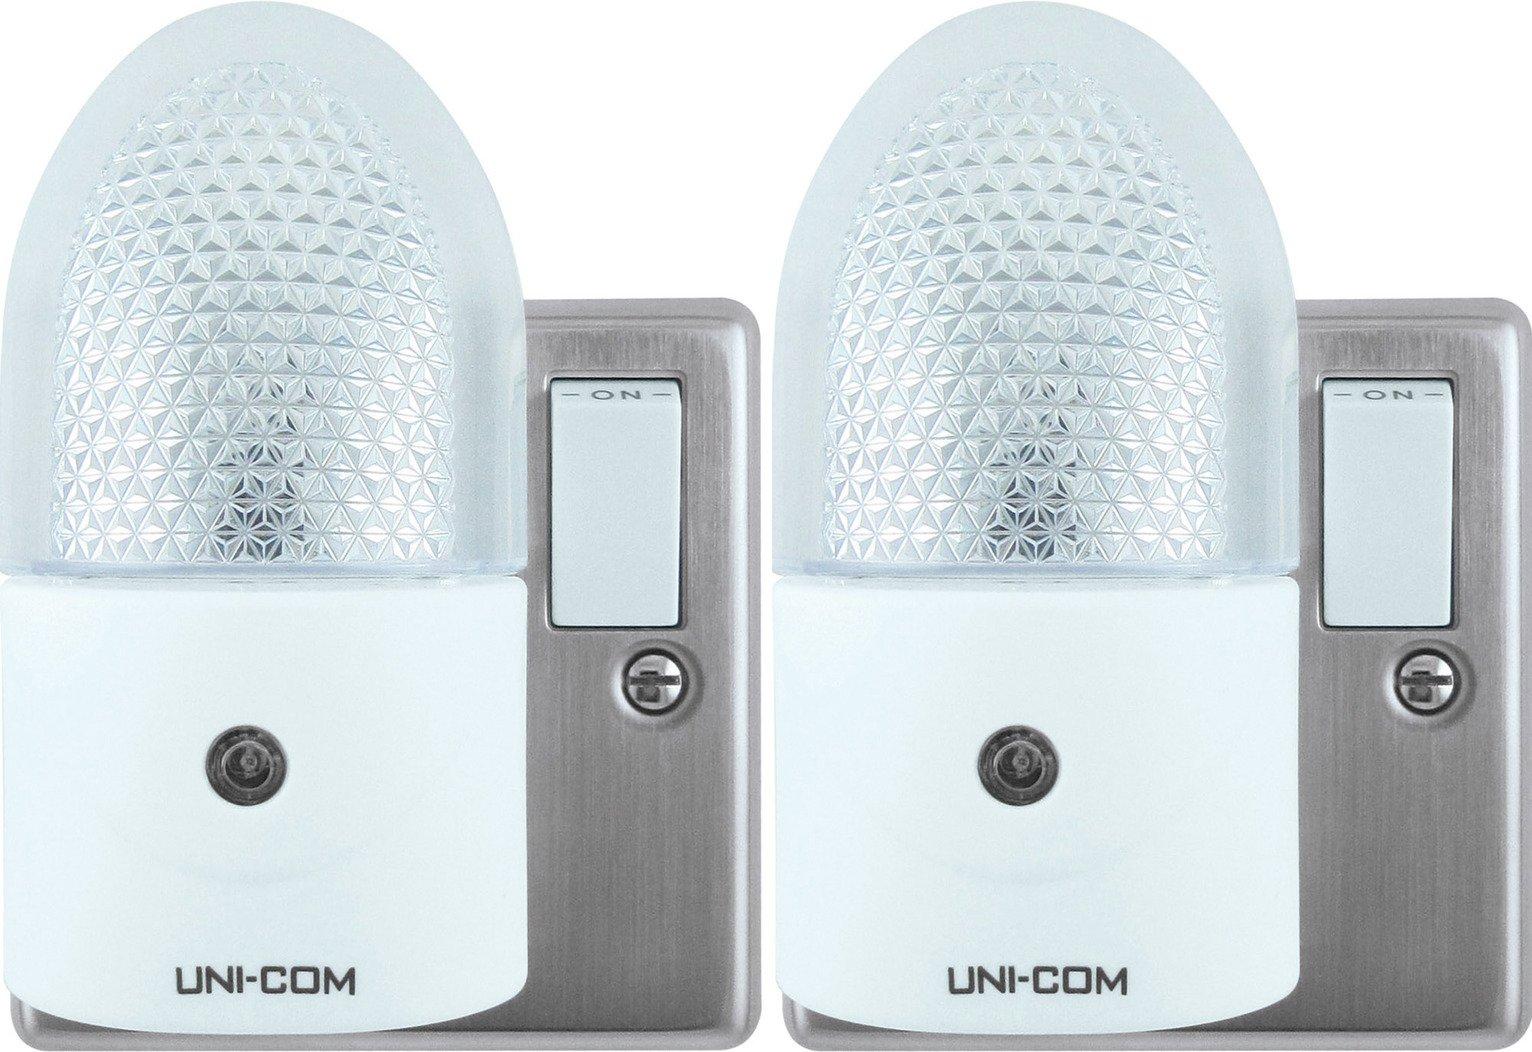 LED Night Light Twin Pack Uni-Com